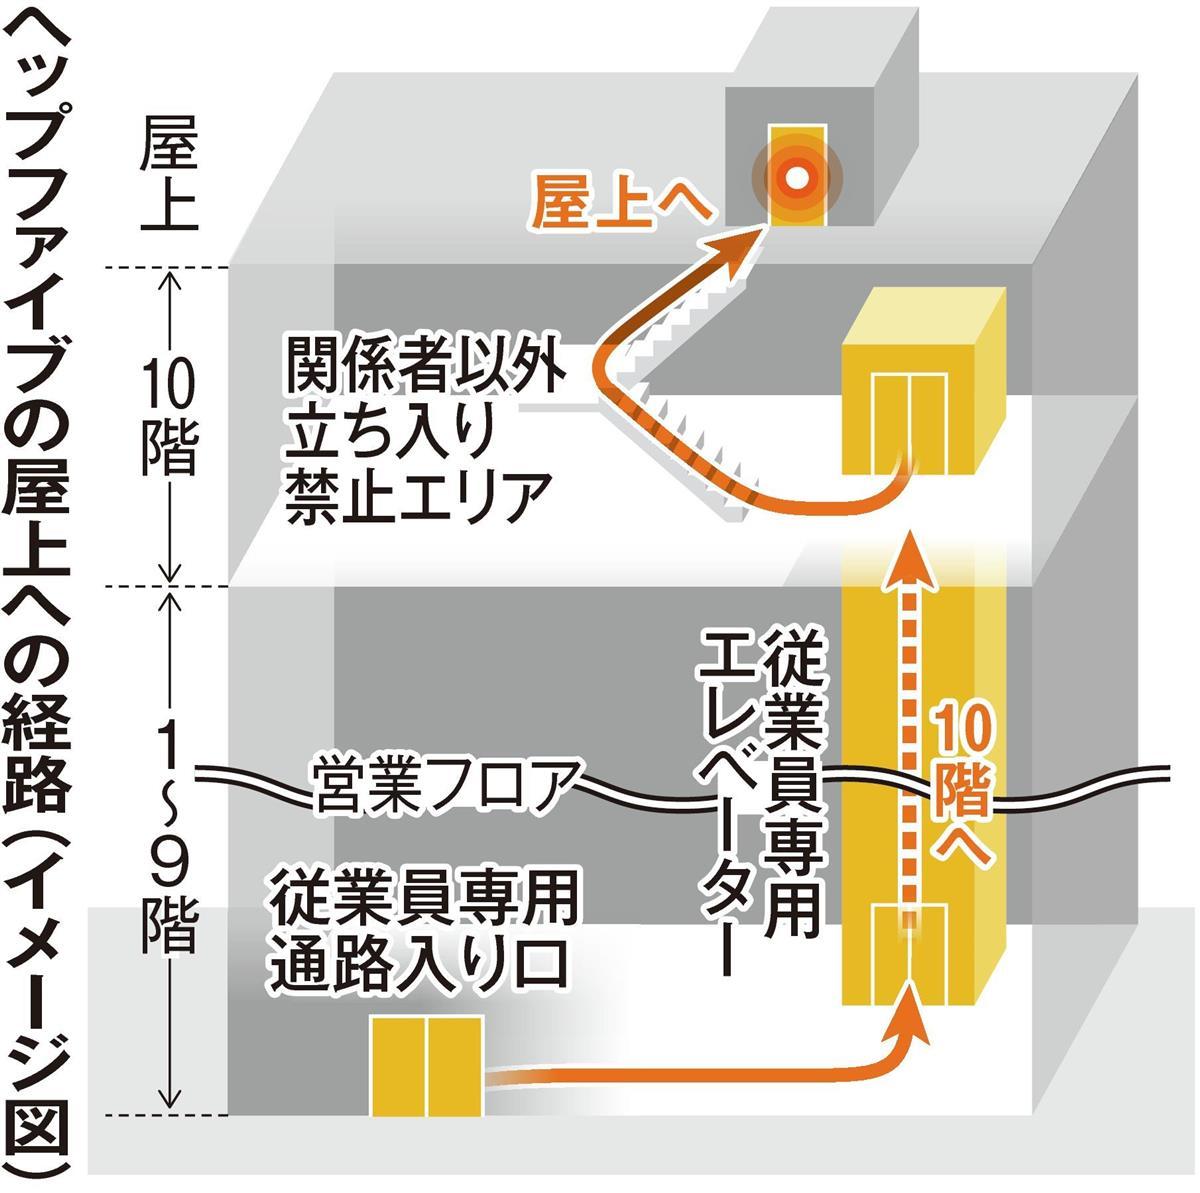 Five 飛び降り Hep